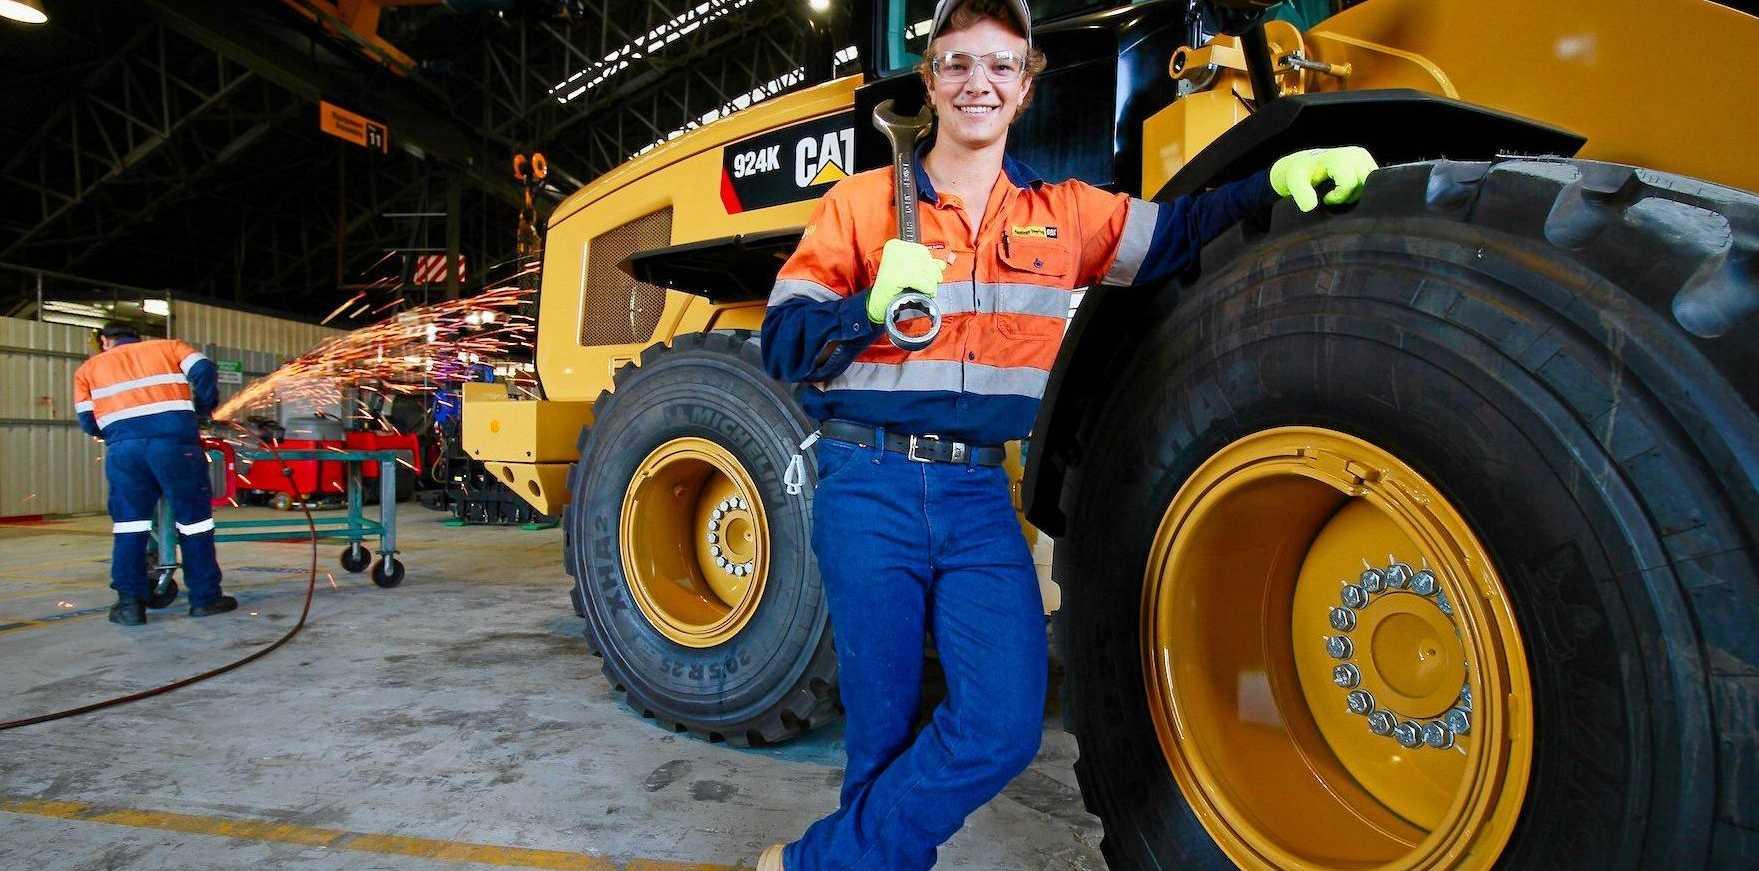 Mackay diesel fitter Tom Bourne has won the CAT Top Dealer Apprentice of the Year award.